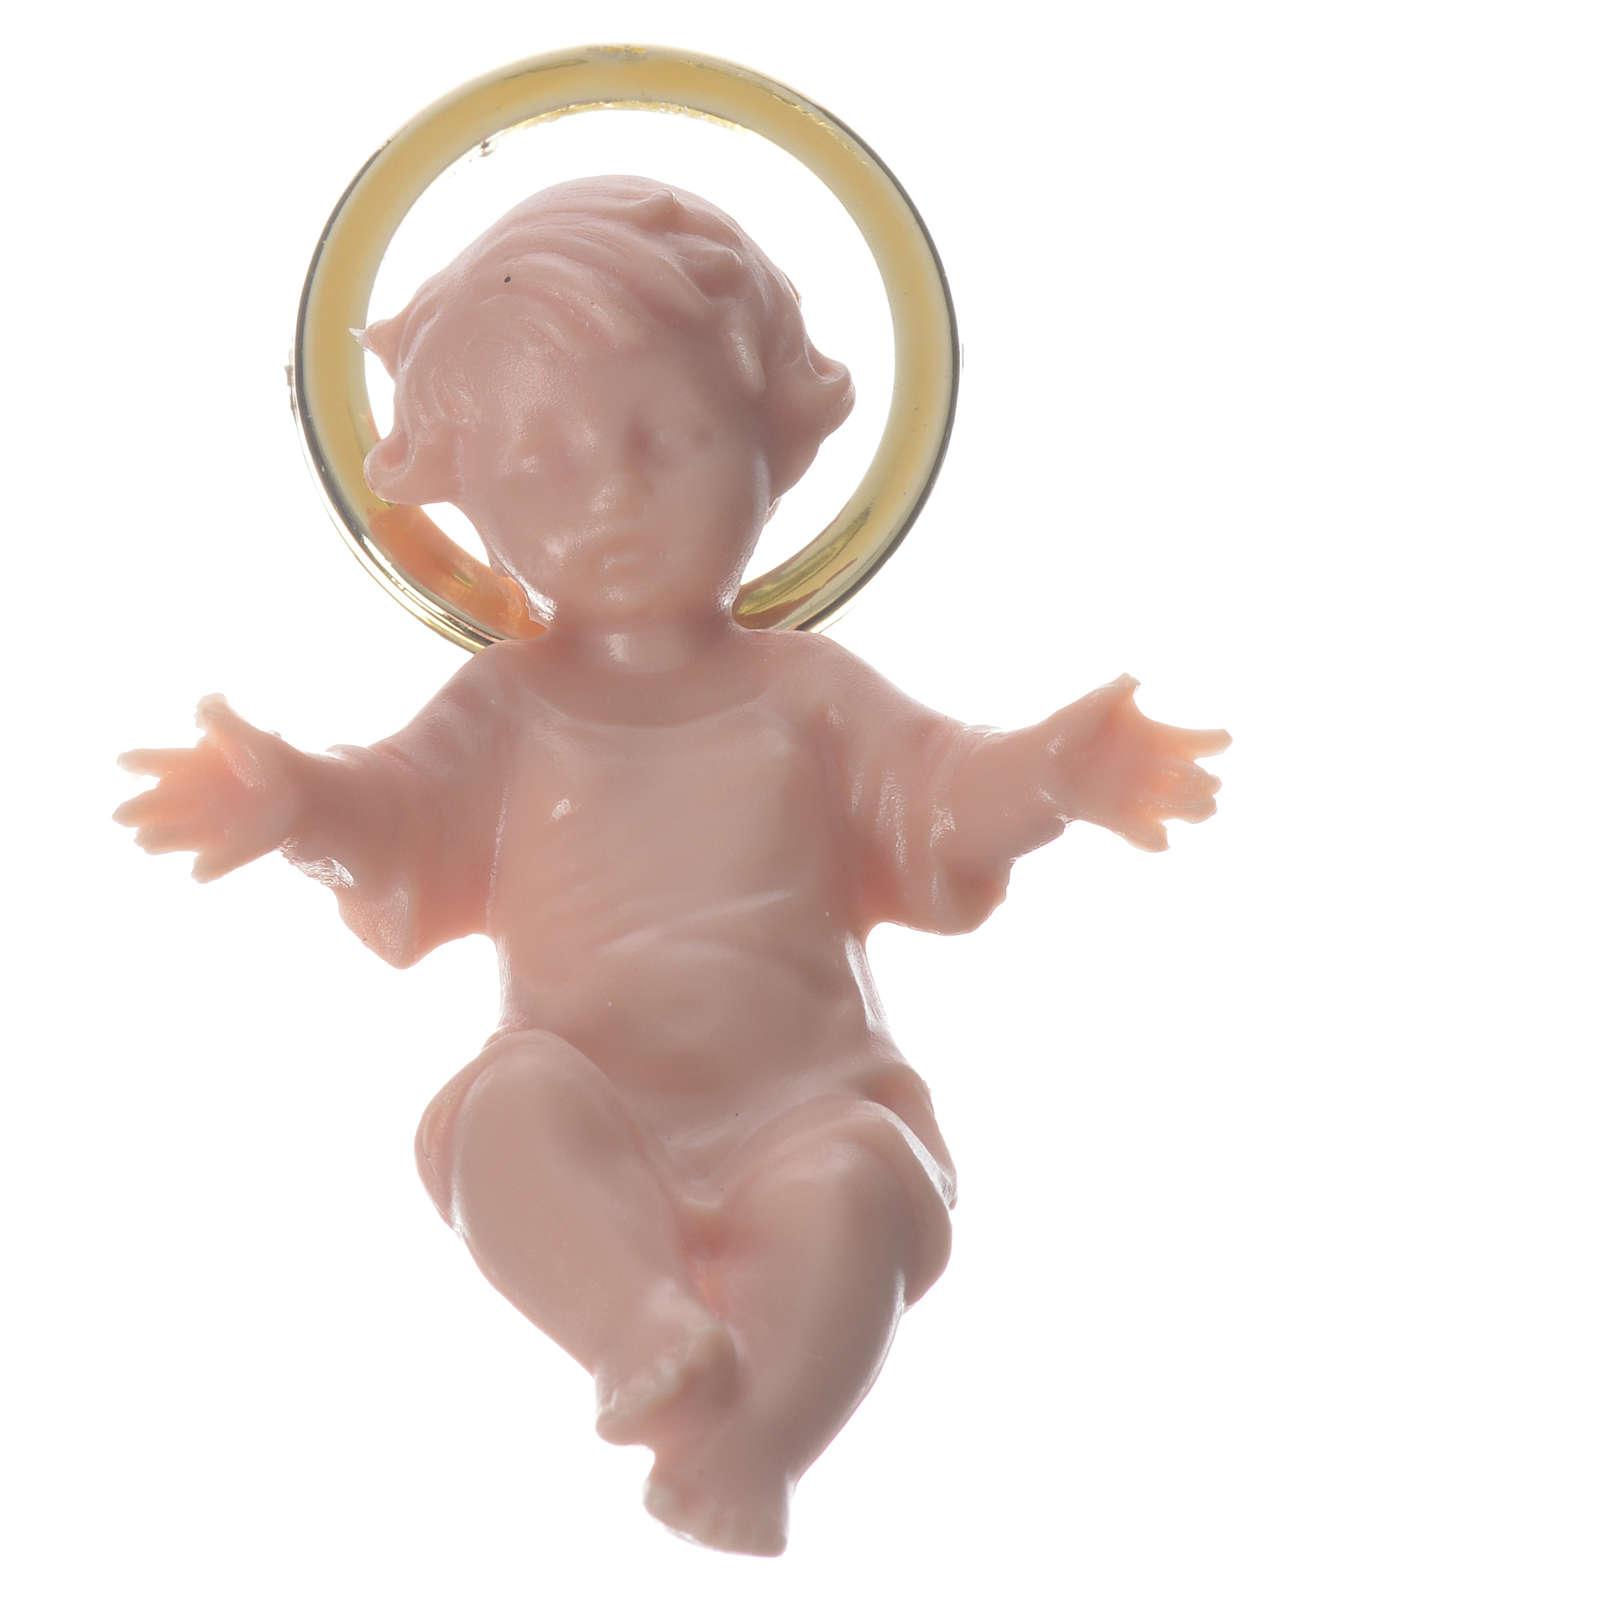 Baby Jesus figurine with golden halo 5 cm 3